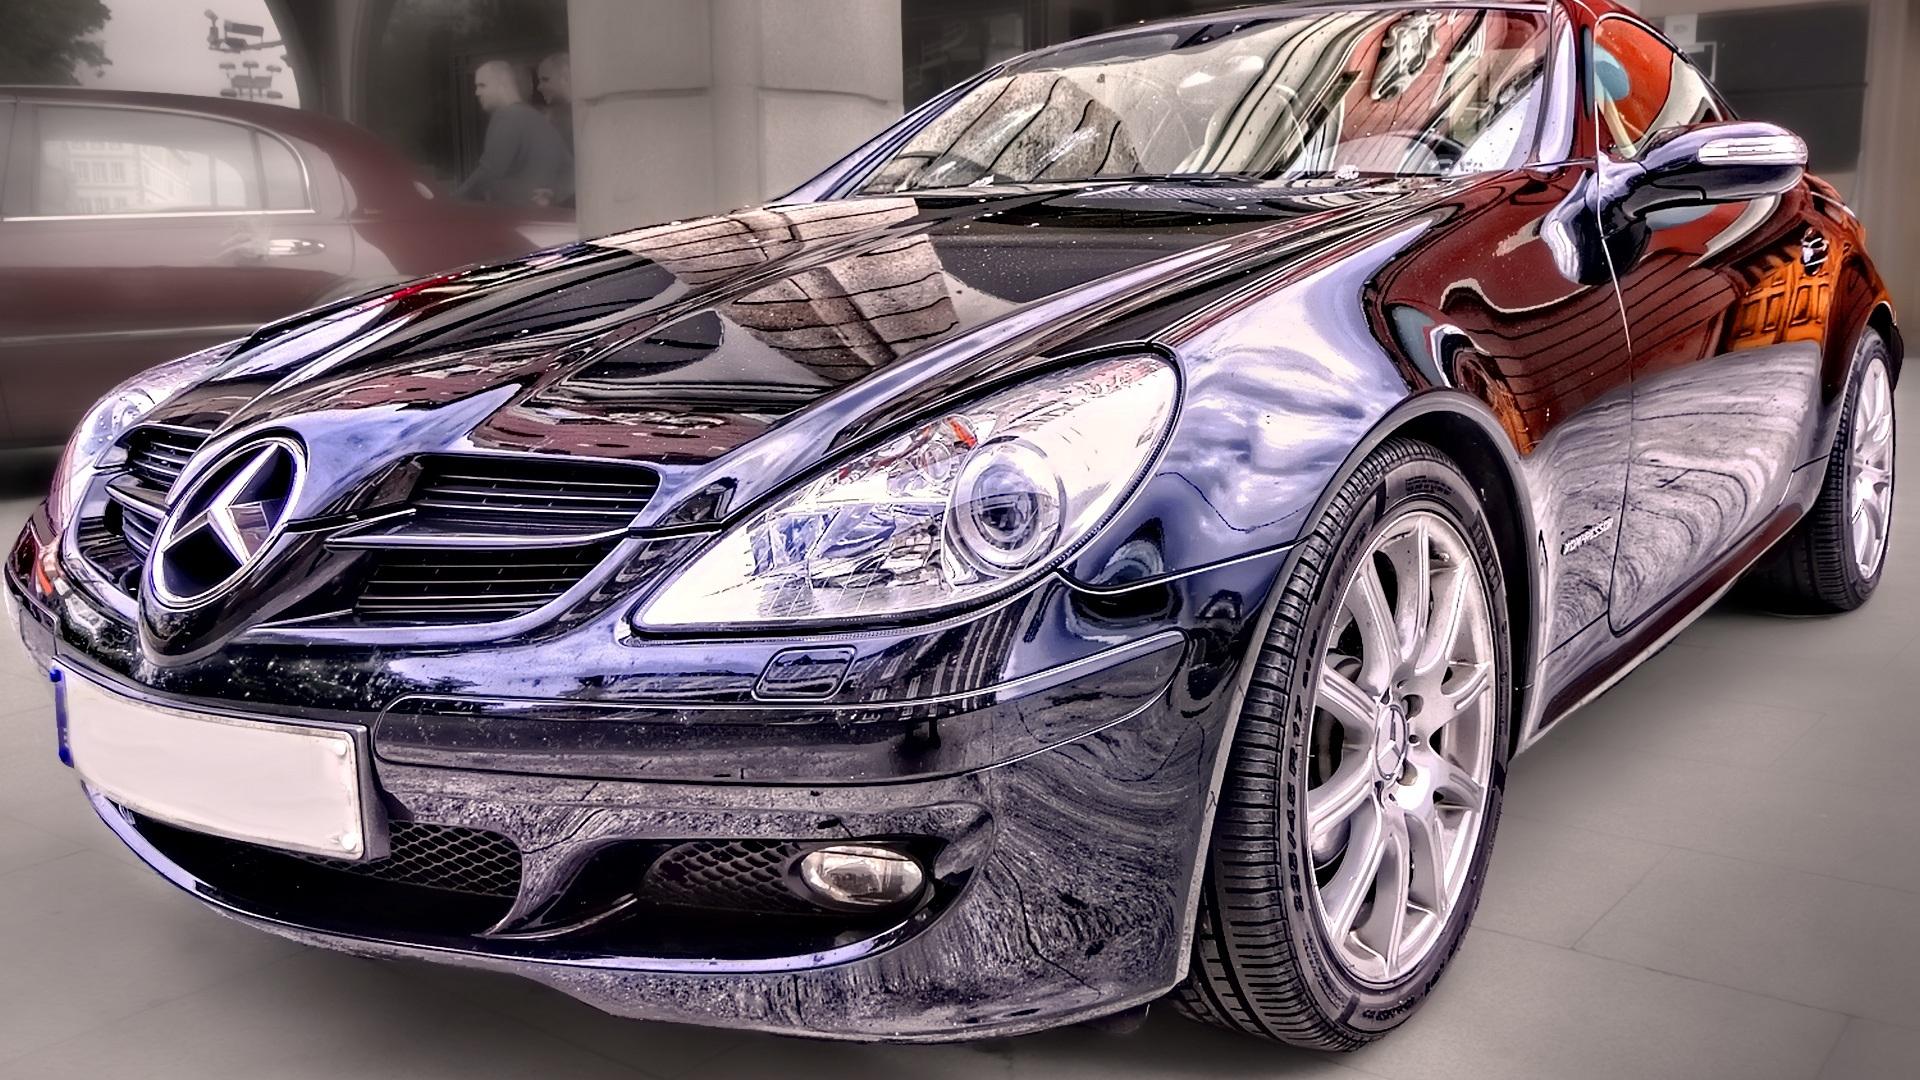 Car Wallpaper Slideshow 2 Mercedes Slk Hd Wallpapers Backgrounds Wallpaper Abyss